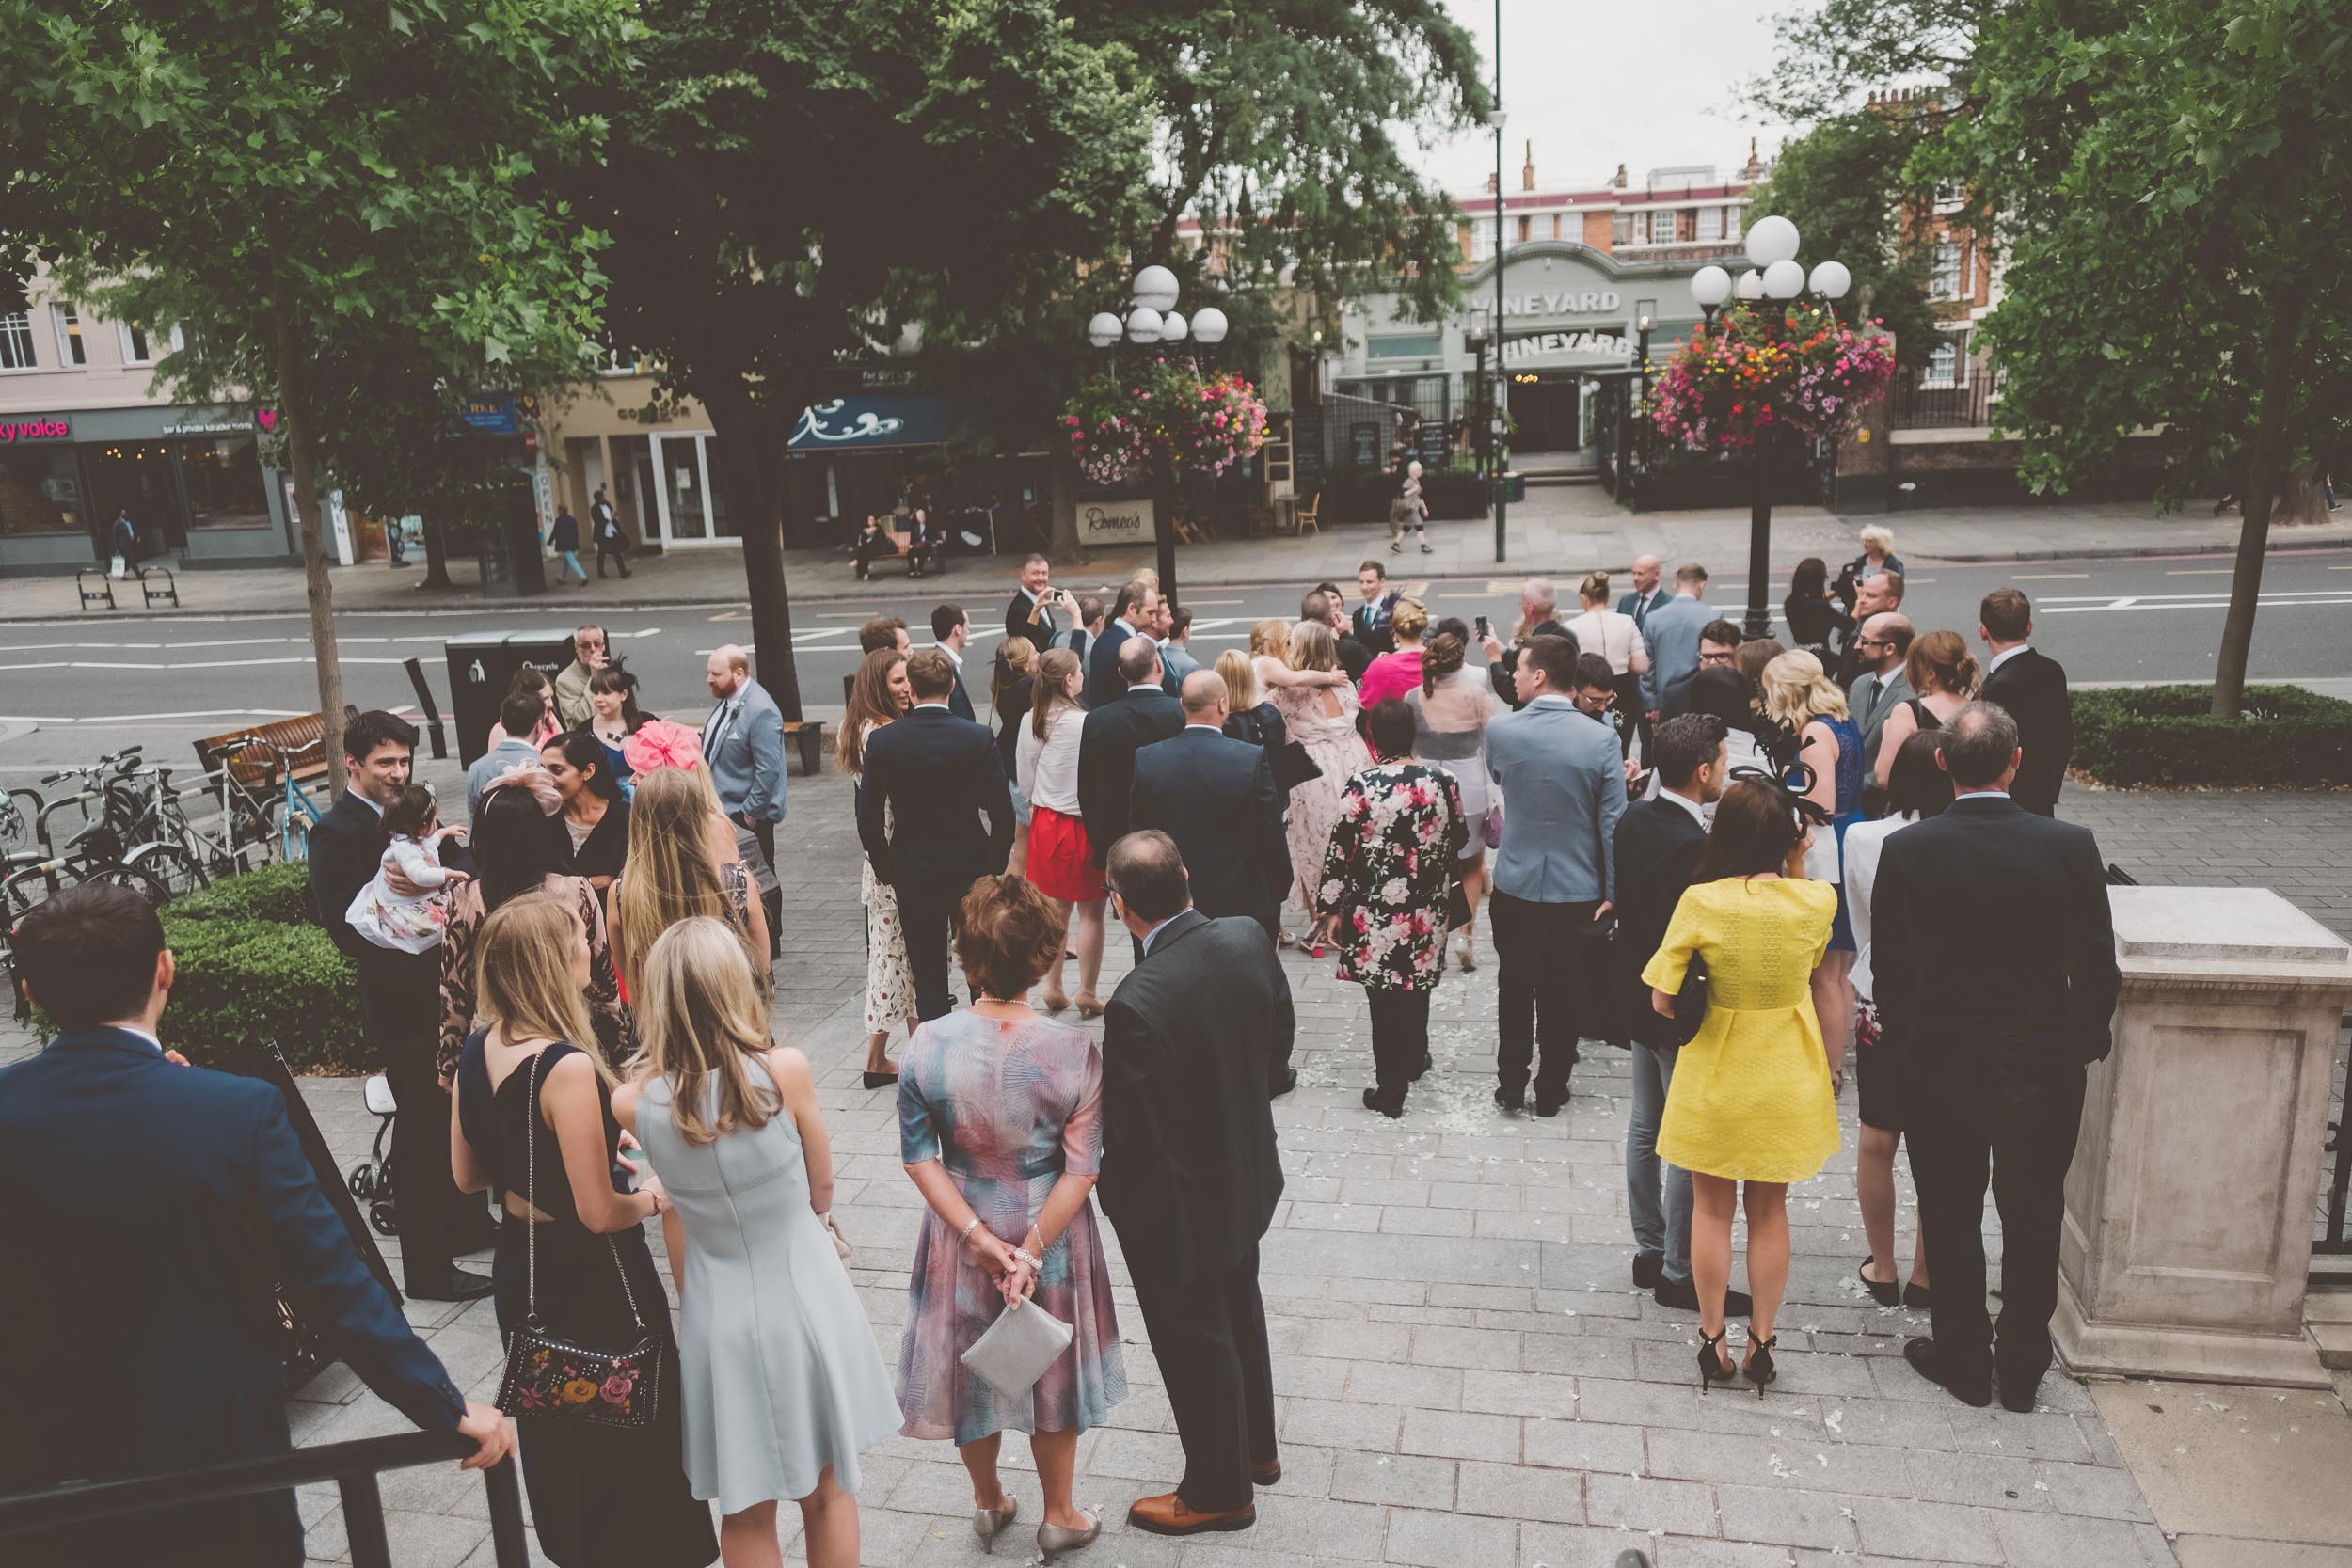 islington-town-hall-4th-floor-studios-wedding163.jpg